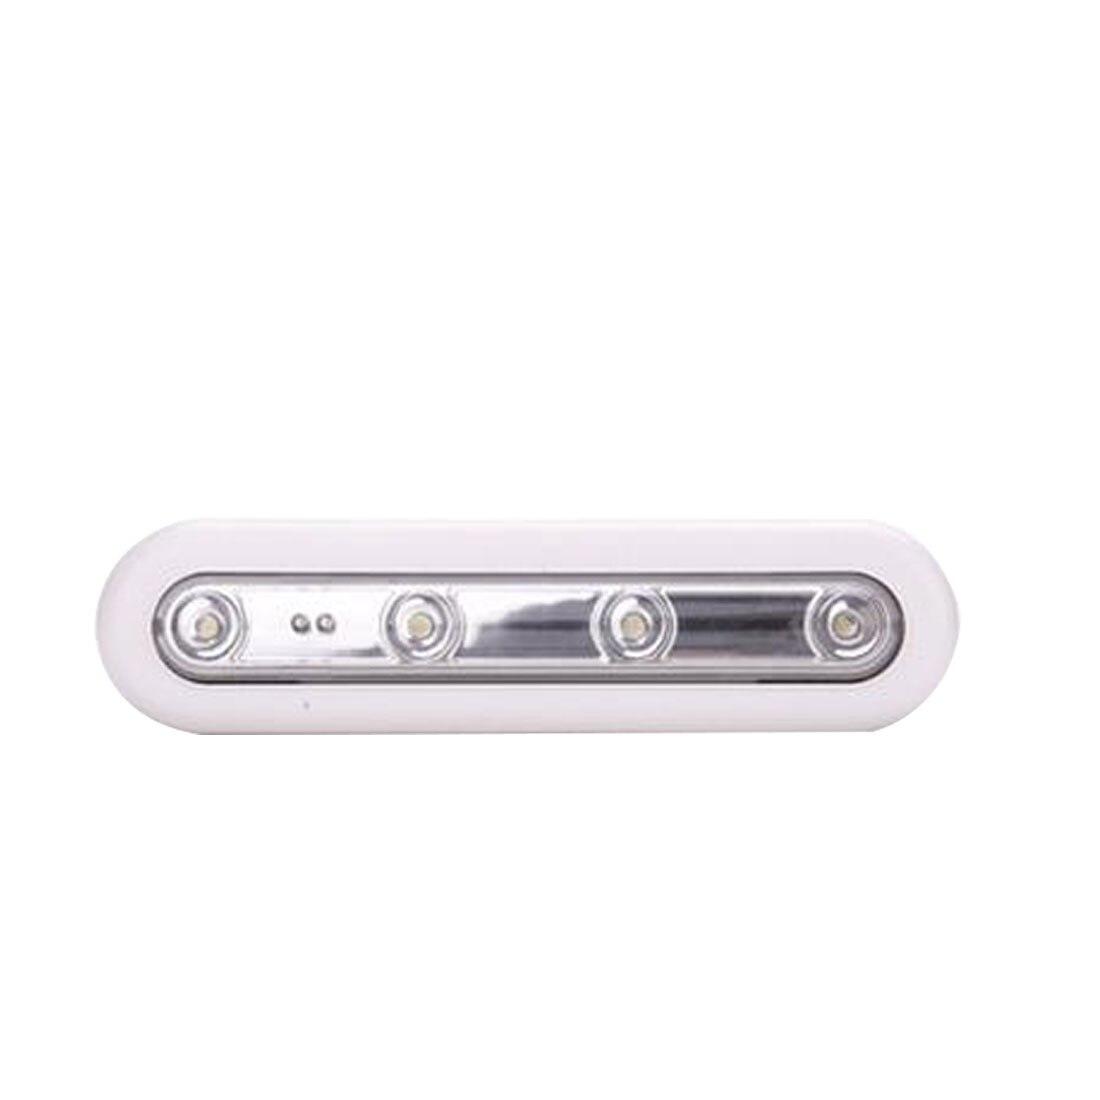 Closet Insertion 4 LED Touch Sensor Light Push Light Disaster Emergency Light Closet